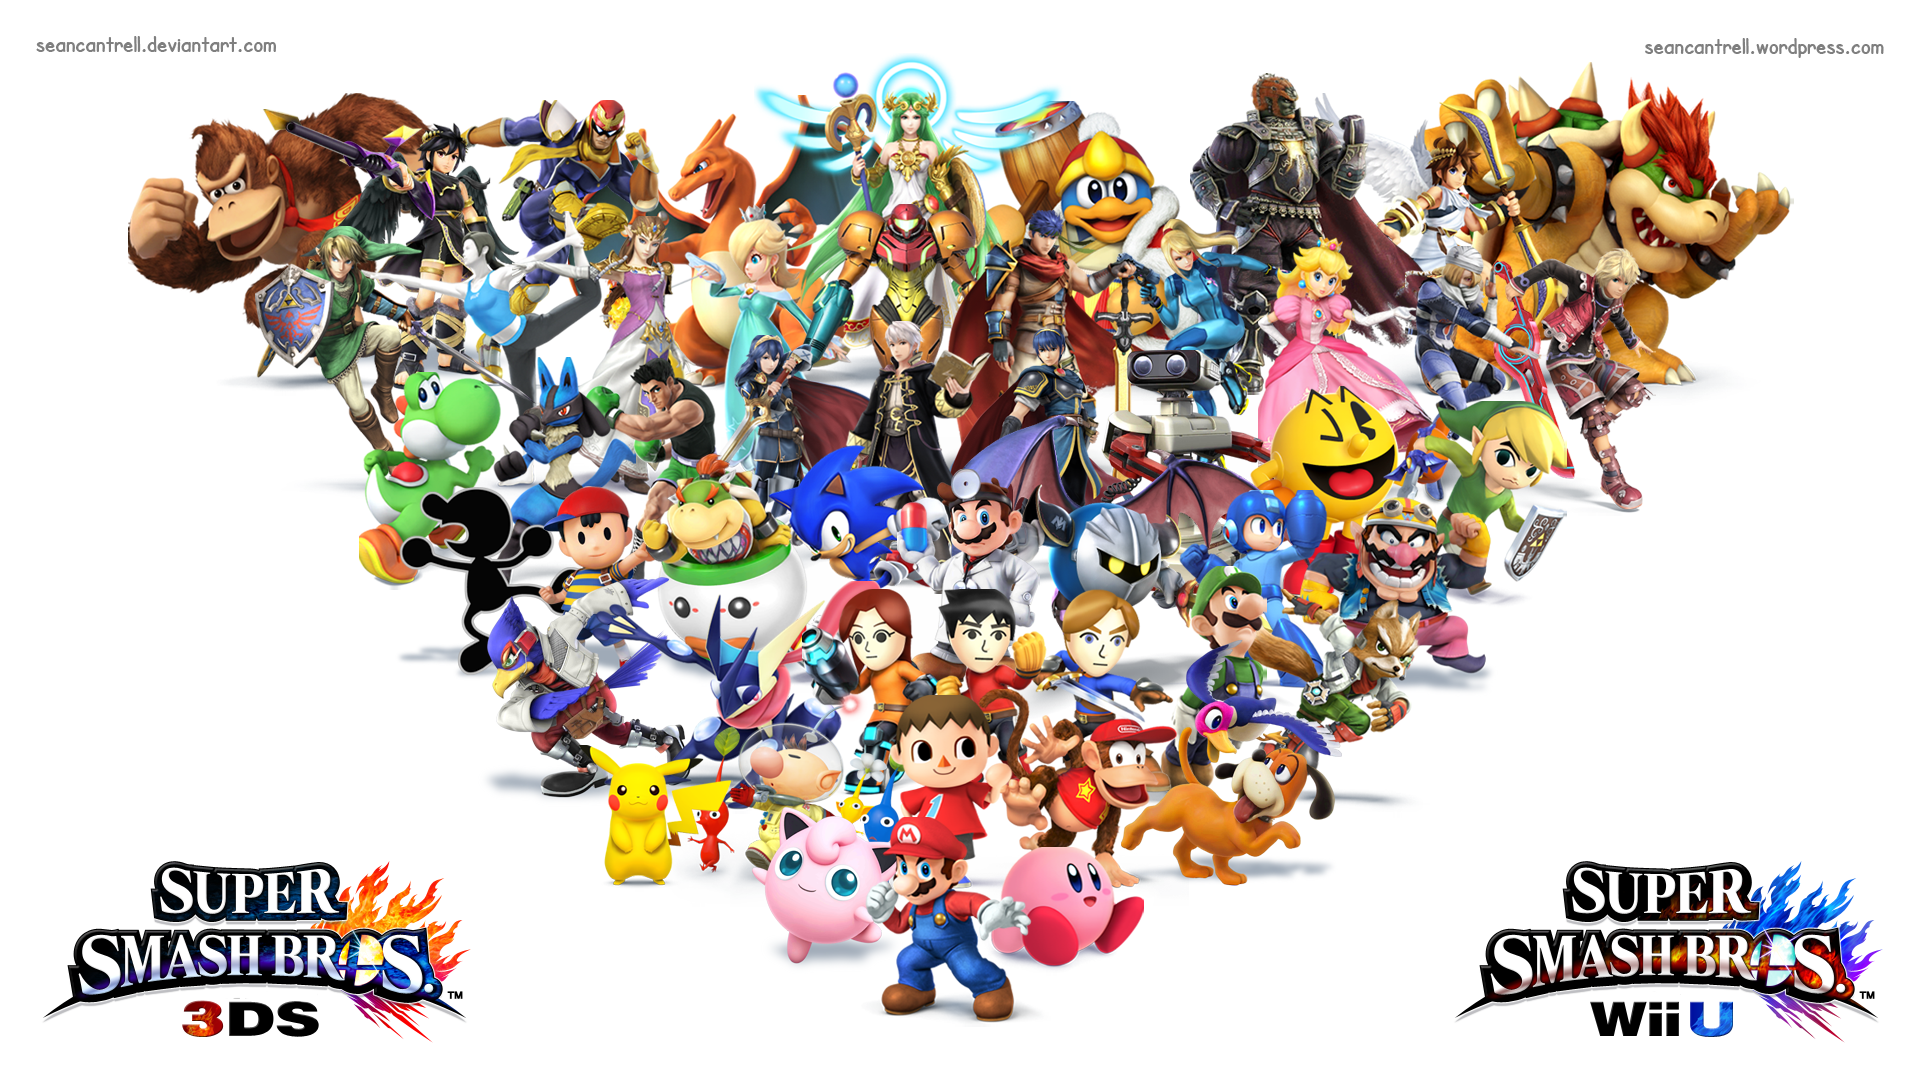 Super Smash Bros For Wii U Wallpapers Top Free Super Smash Bros